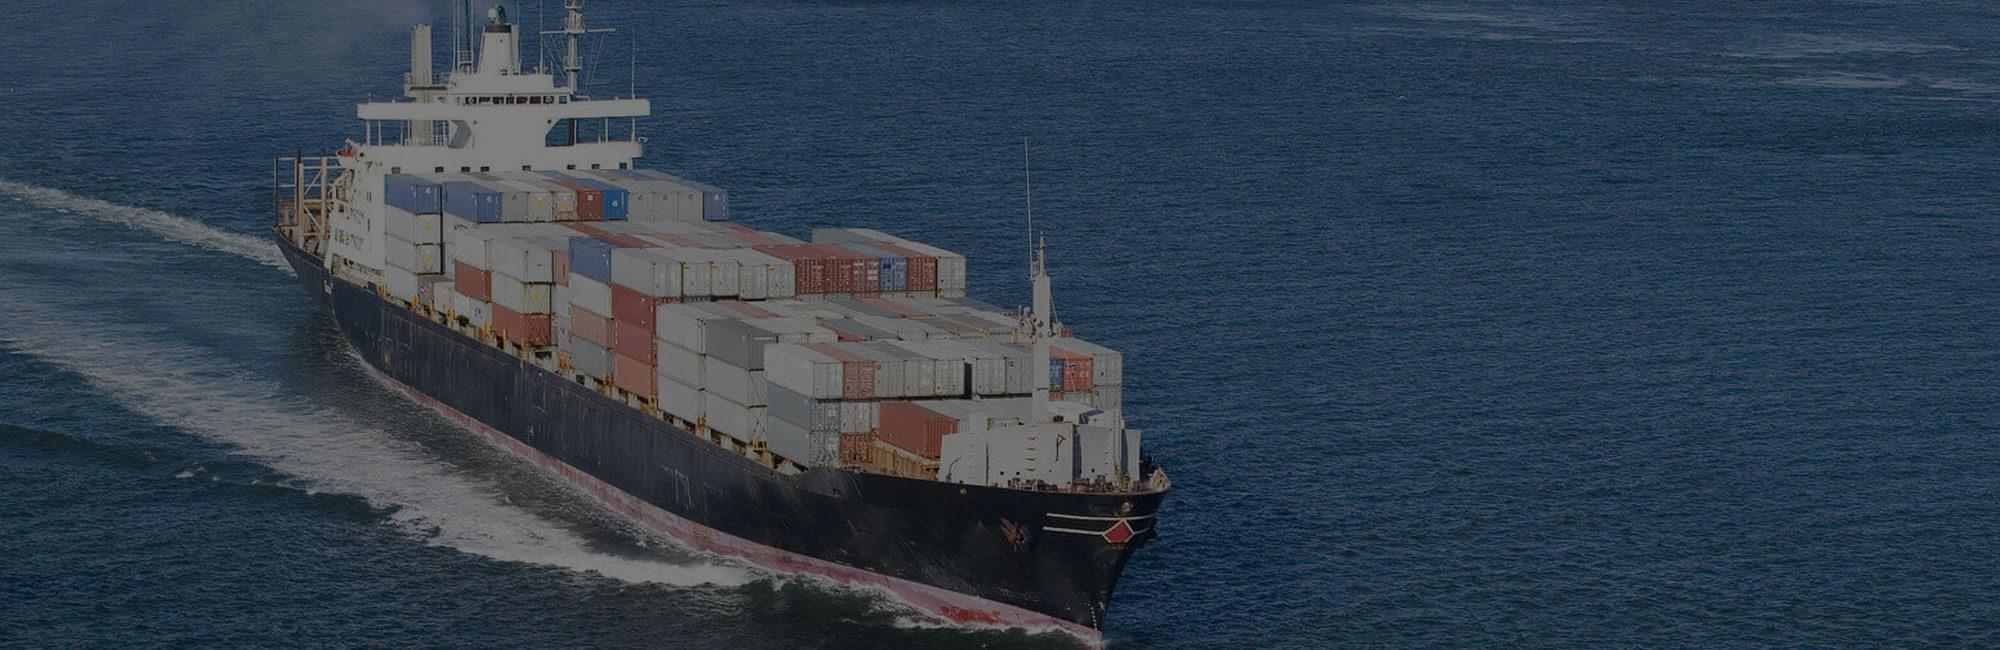 Full Service Ship